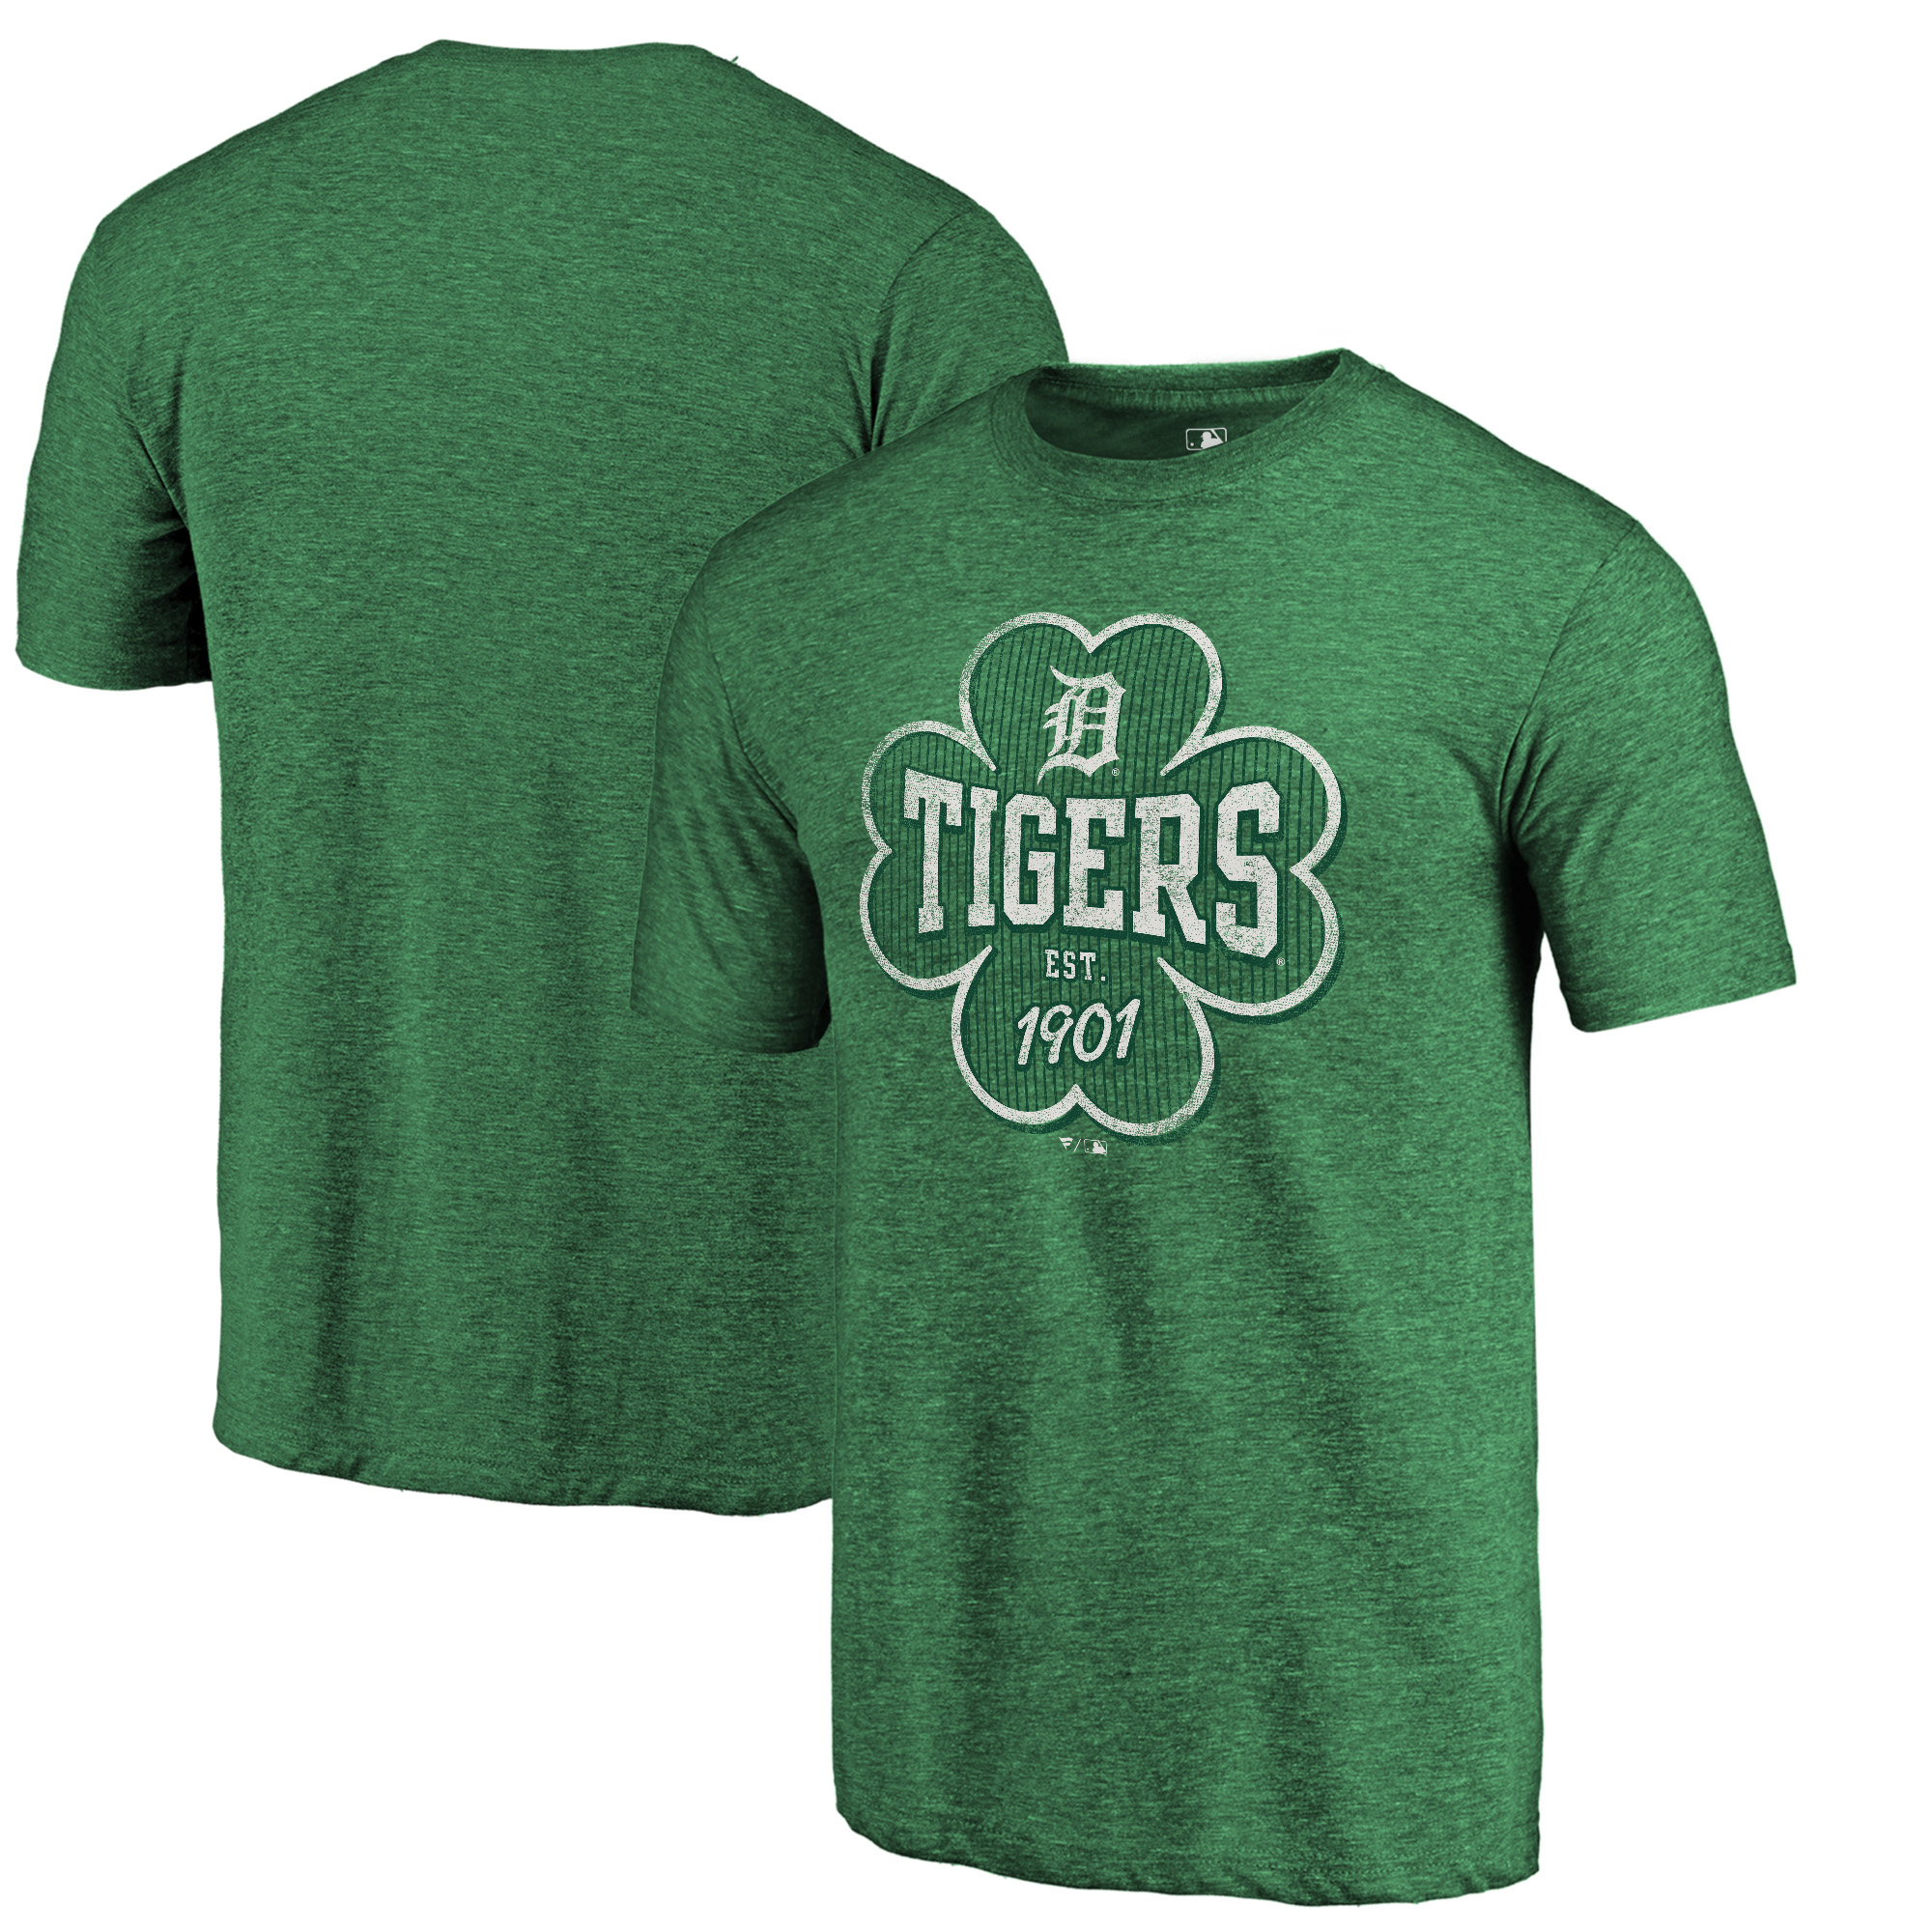 Detroit Tigers Fanatics Branded 2018 St. Patrick's Day Emerald Isle Tri-Blend T-Shirt - Kelly Green